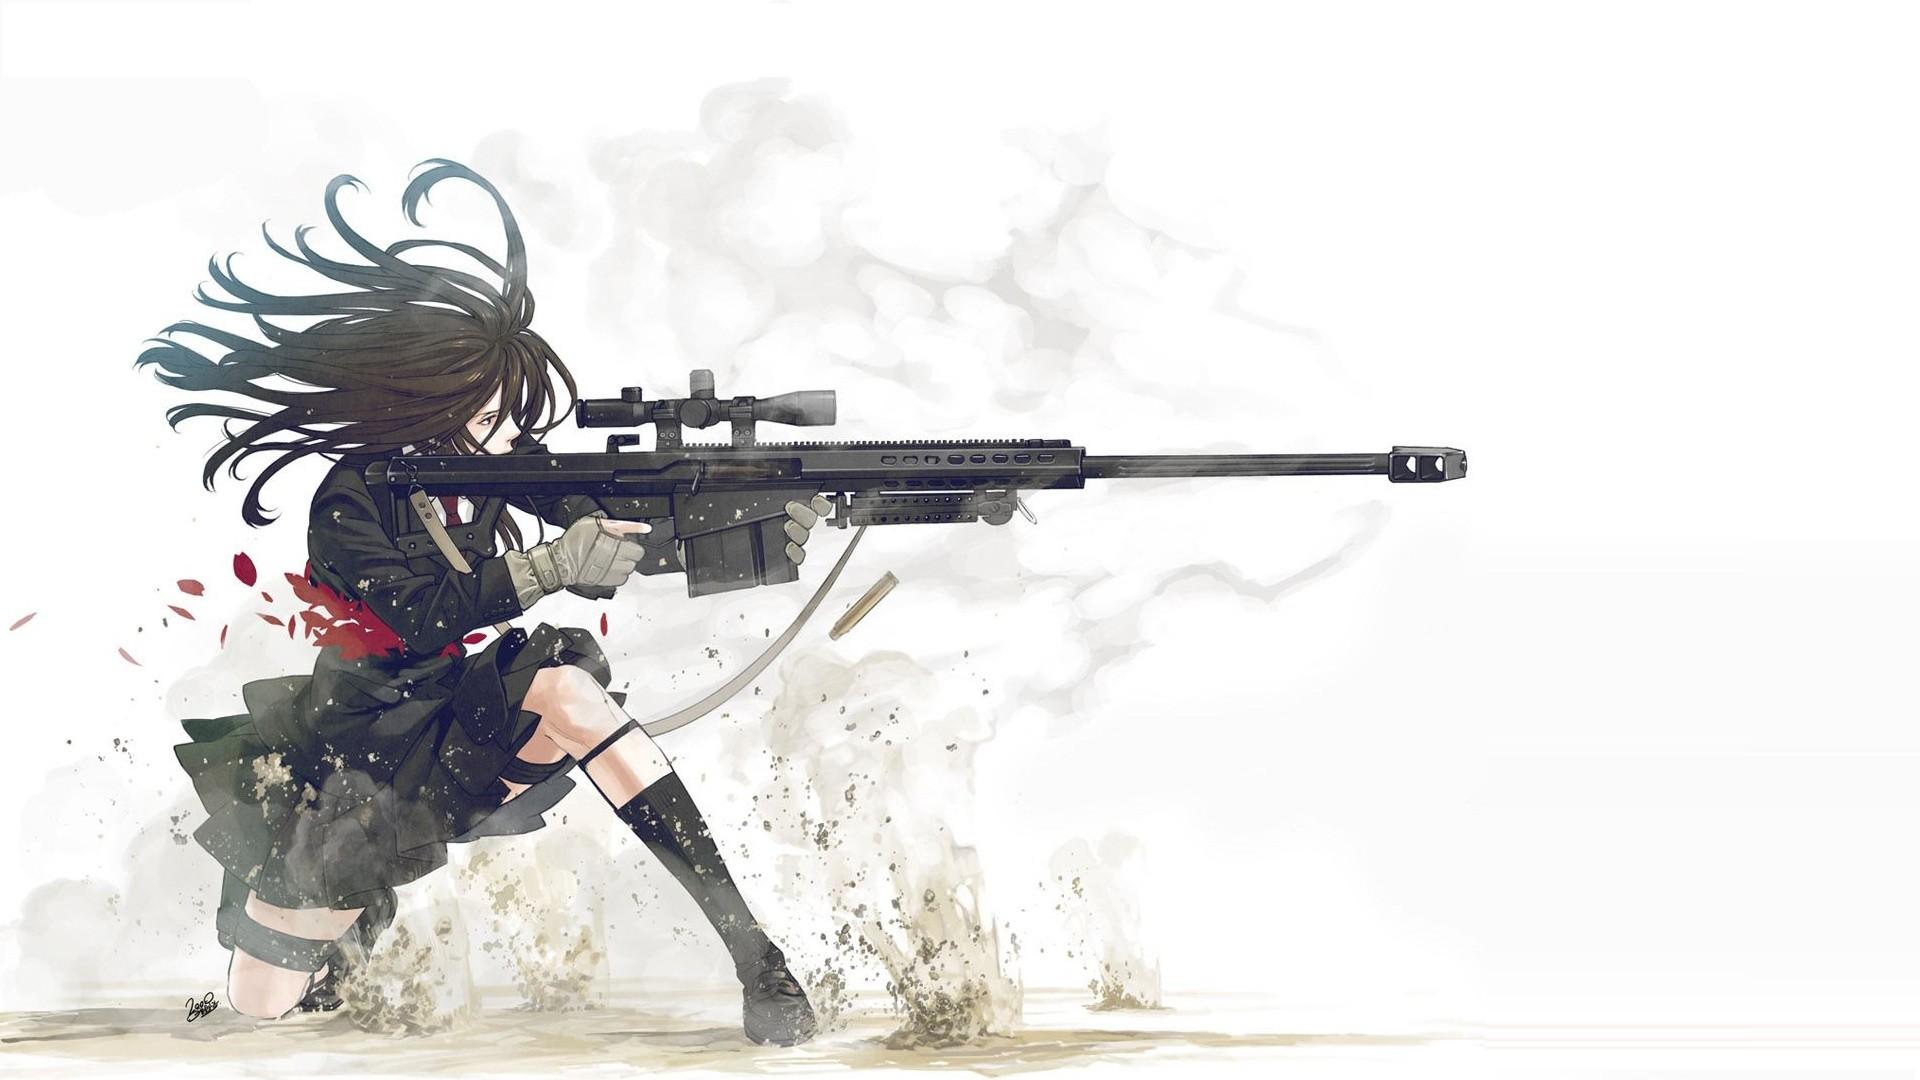 Anime Guns Weapons Manga Anime Girls White Background - Anime Girl With Sniper - HD Wallpaper